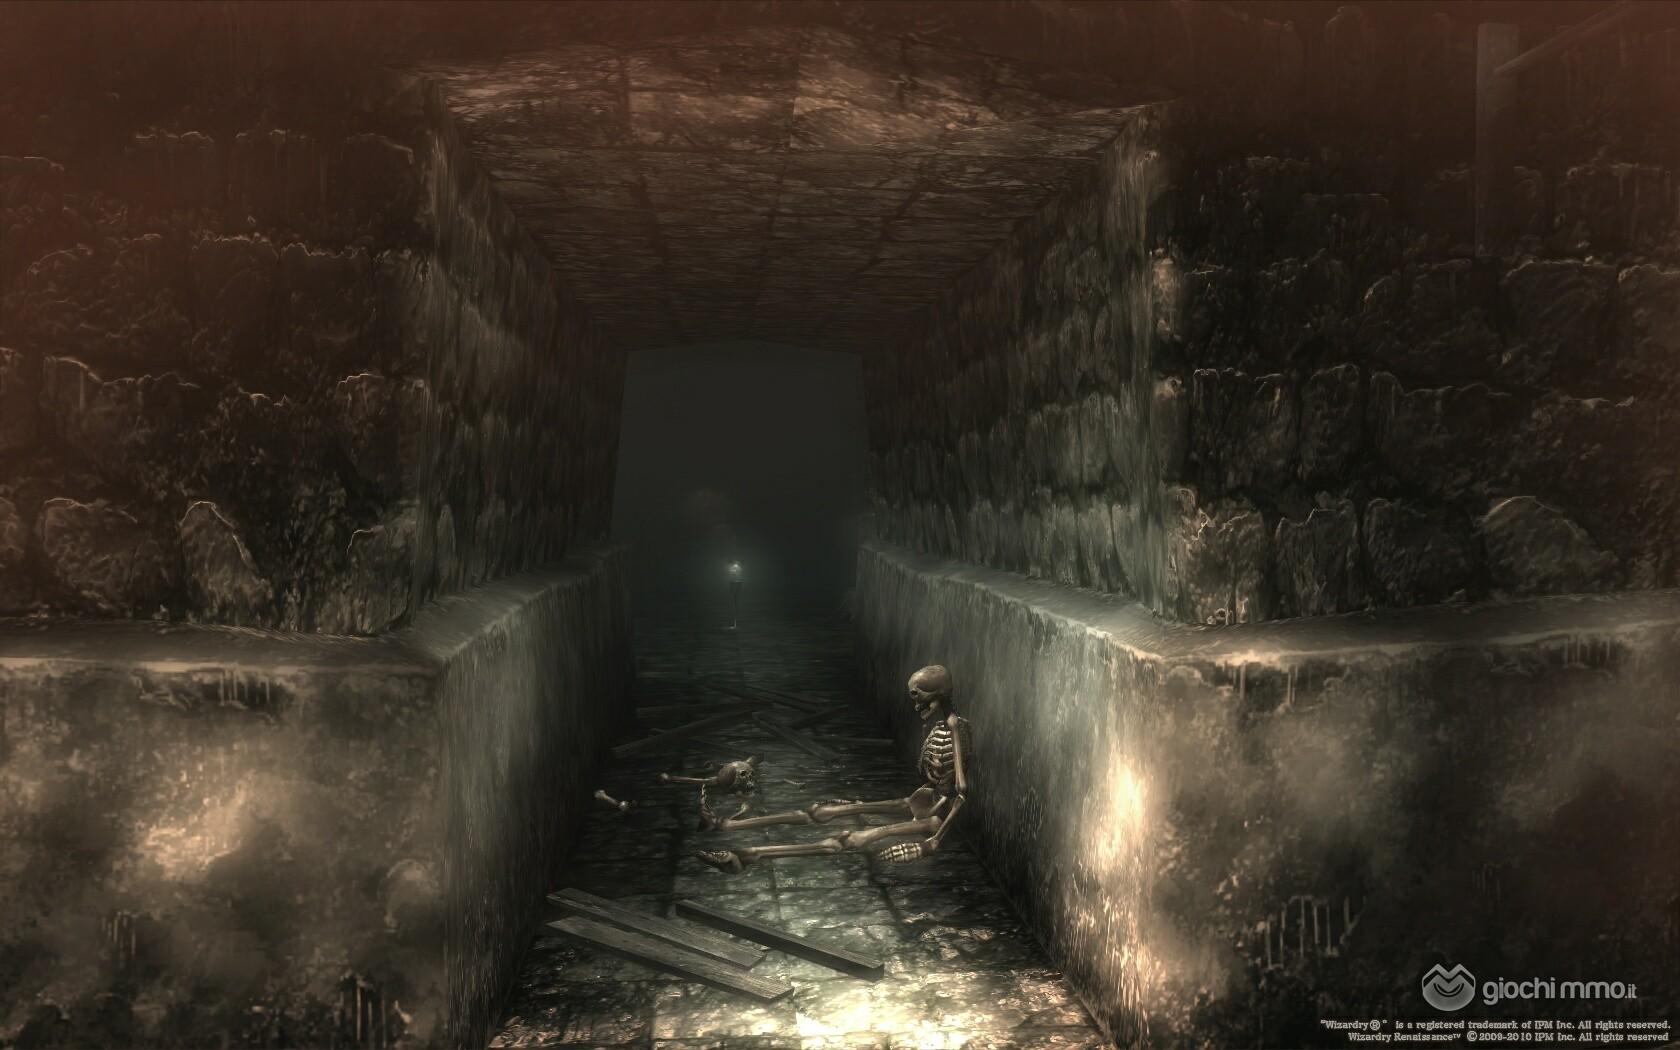 Clicca sull'immagine per ingrandirlaNome:   Wizardry Online screen6.jpgVisite: 22Dimensione:   309.0 KBID: 8301